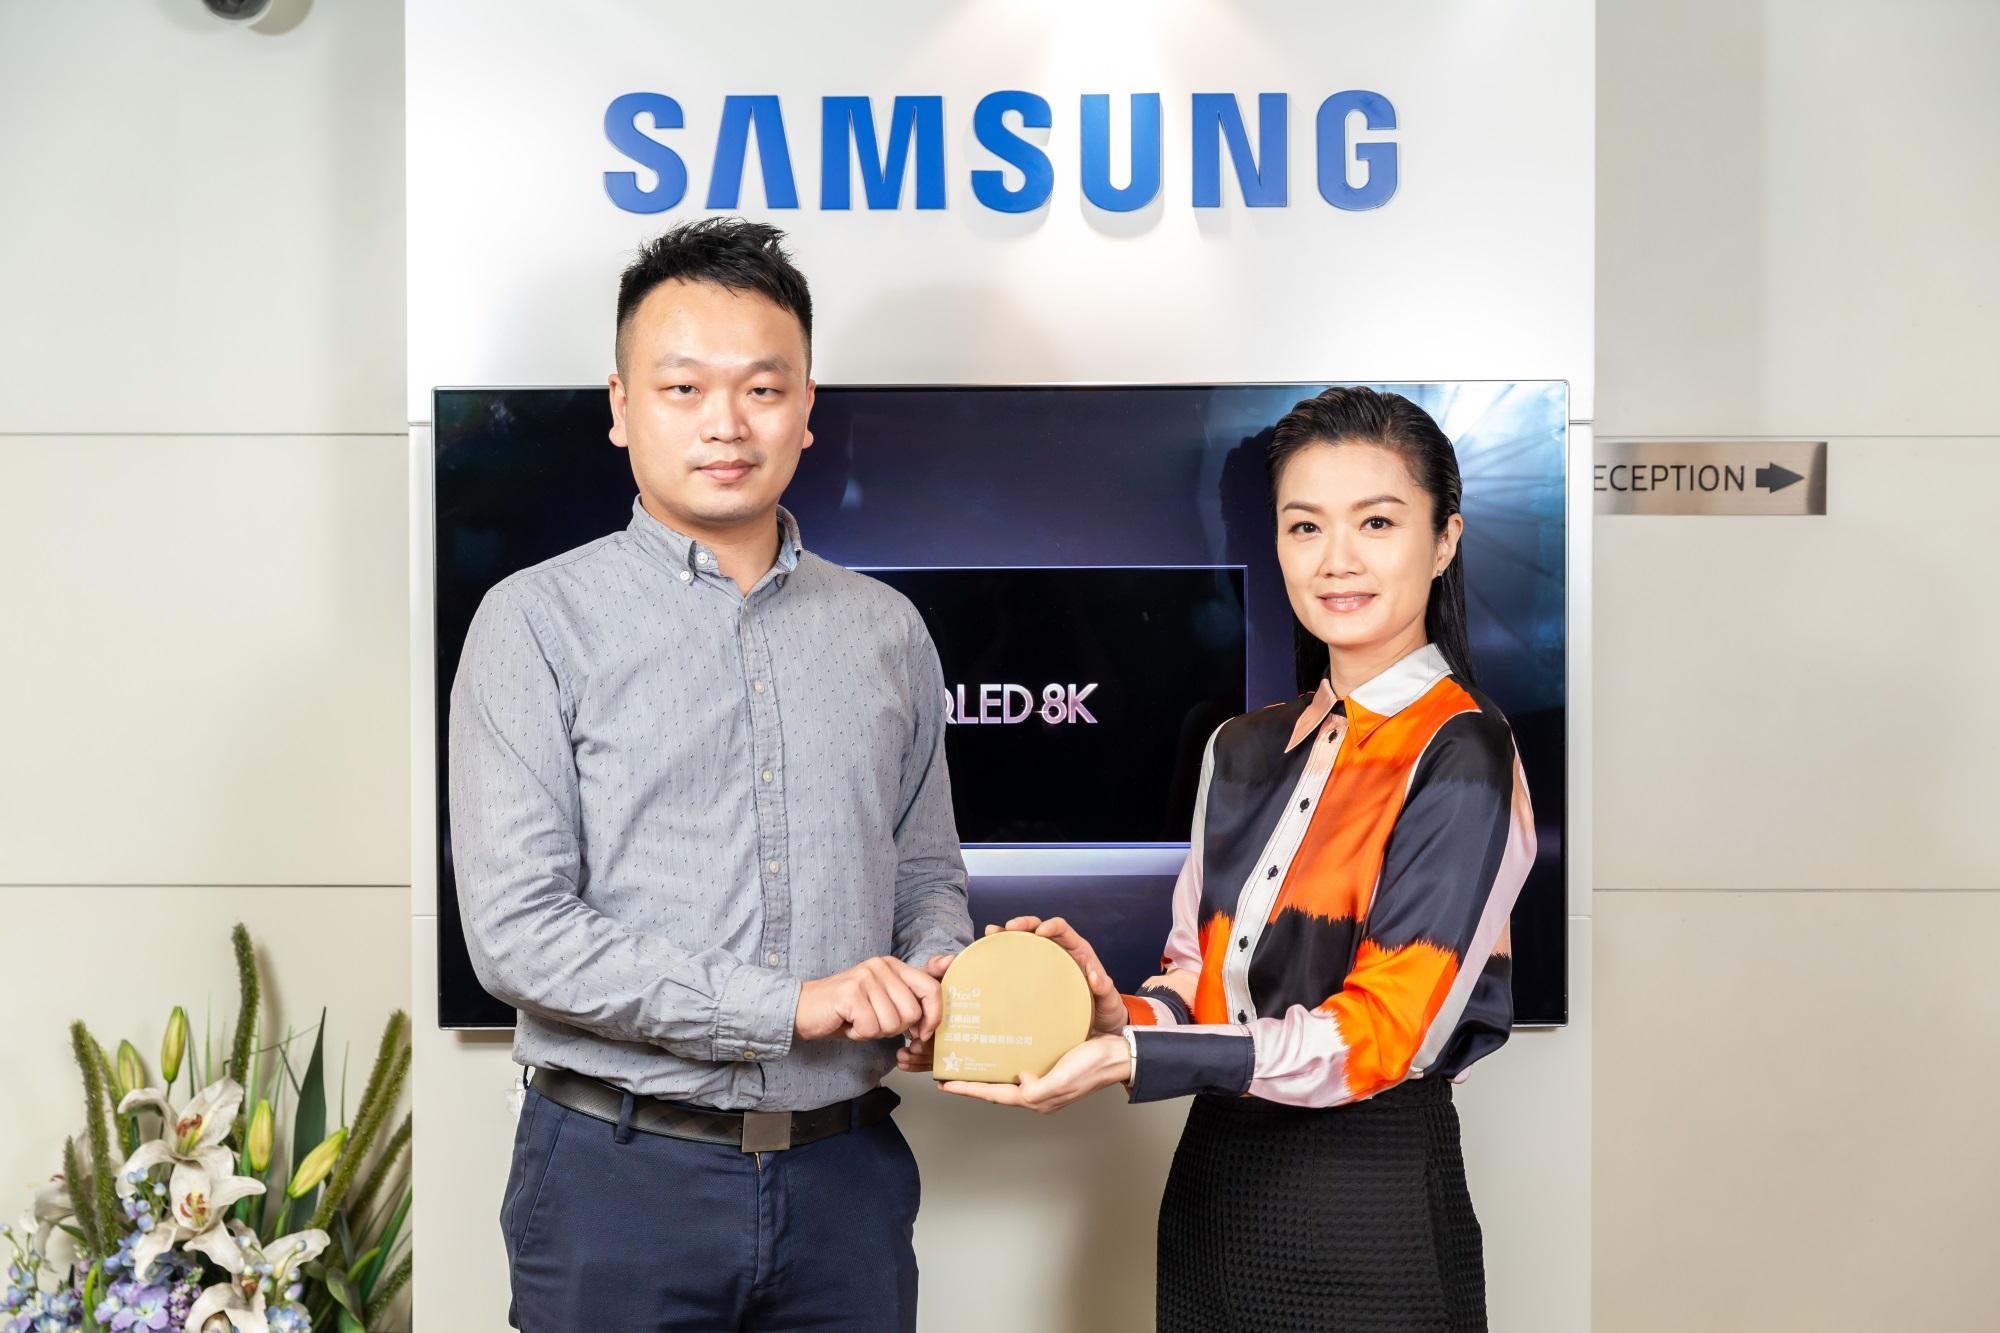 Samsung|Price.com.hk 為消費者開拓精明消費之道Price Consumer Choice Award 2020 傑出品牌分享